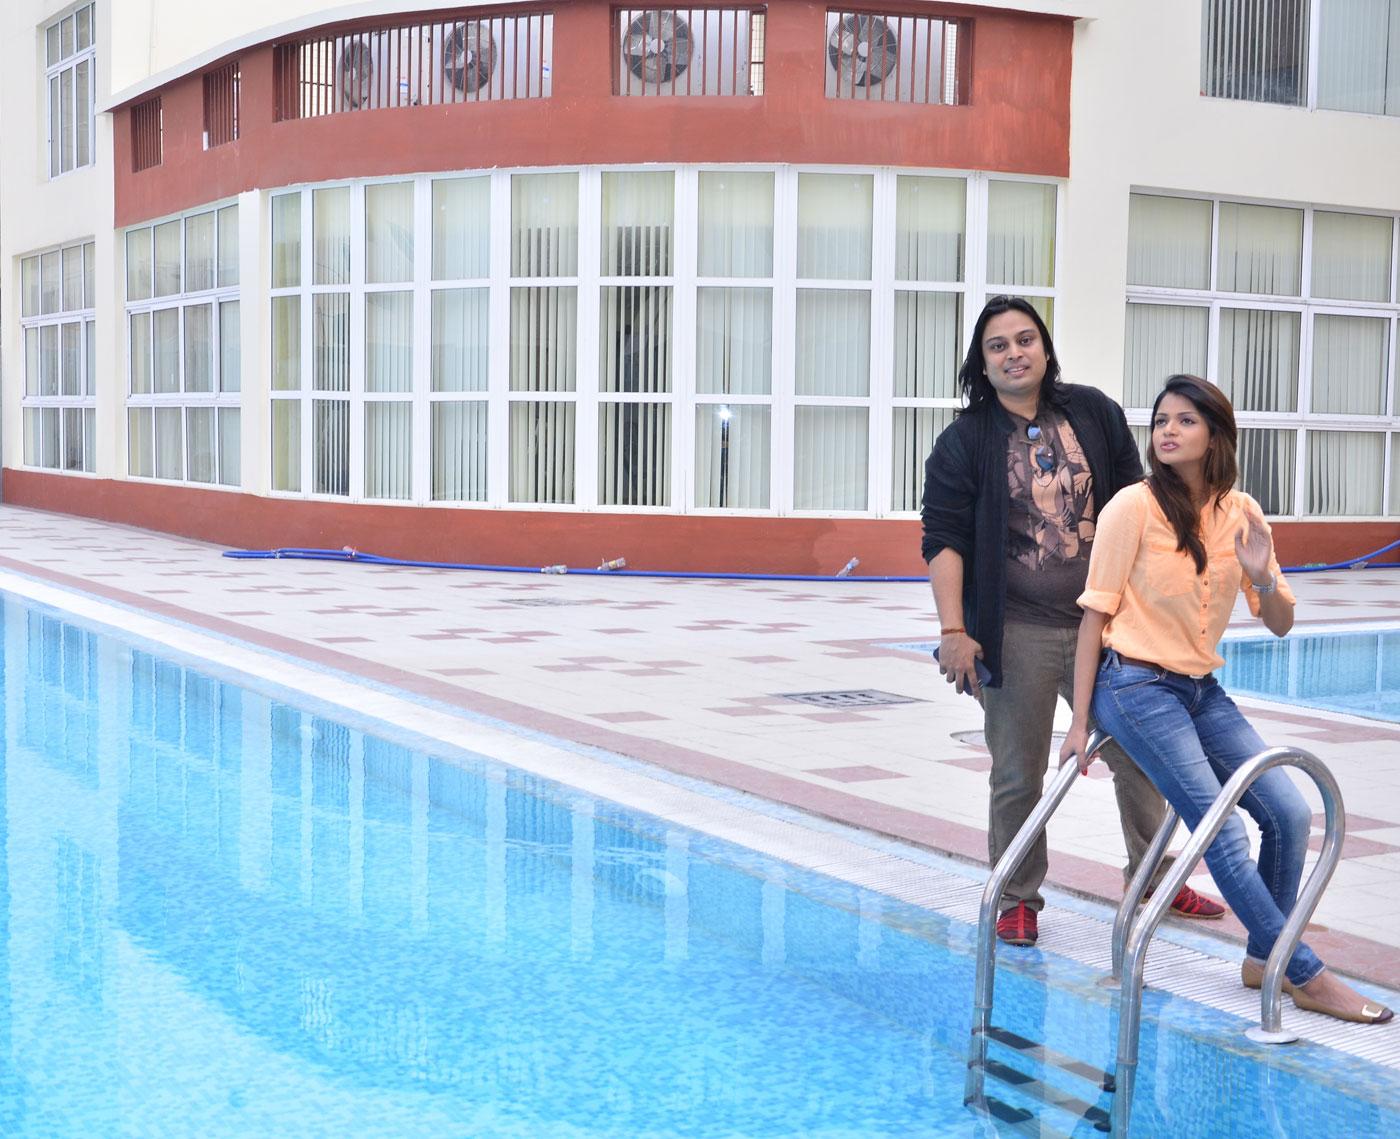 Swimming Pool: Actual Image